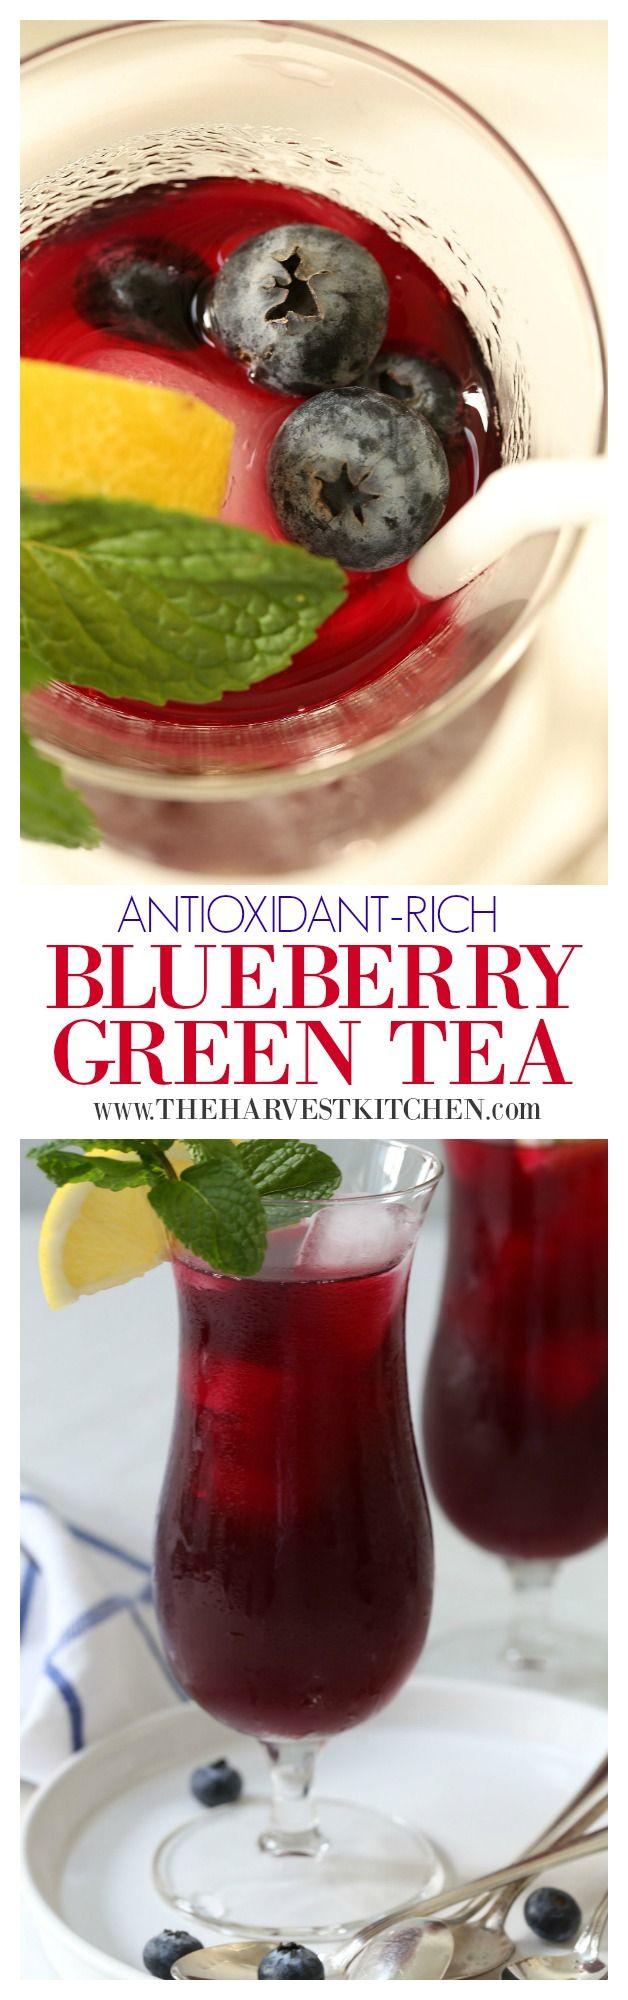 Blauwe bessen groene thee